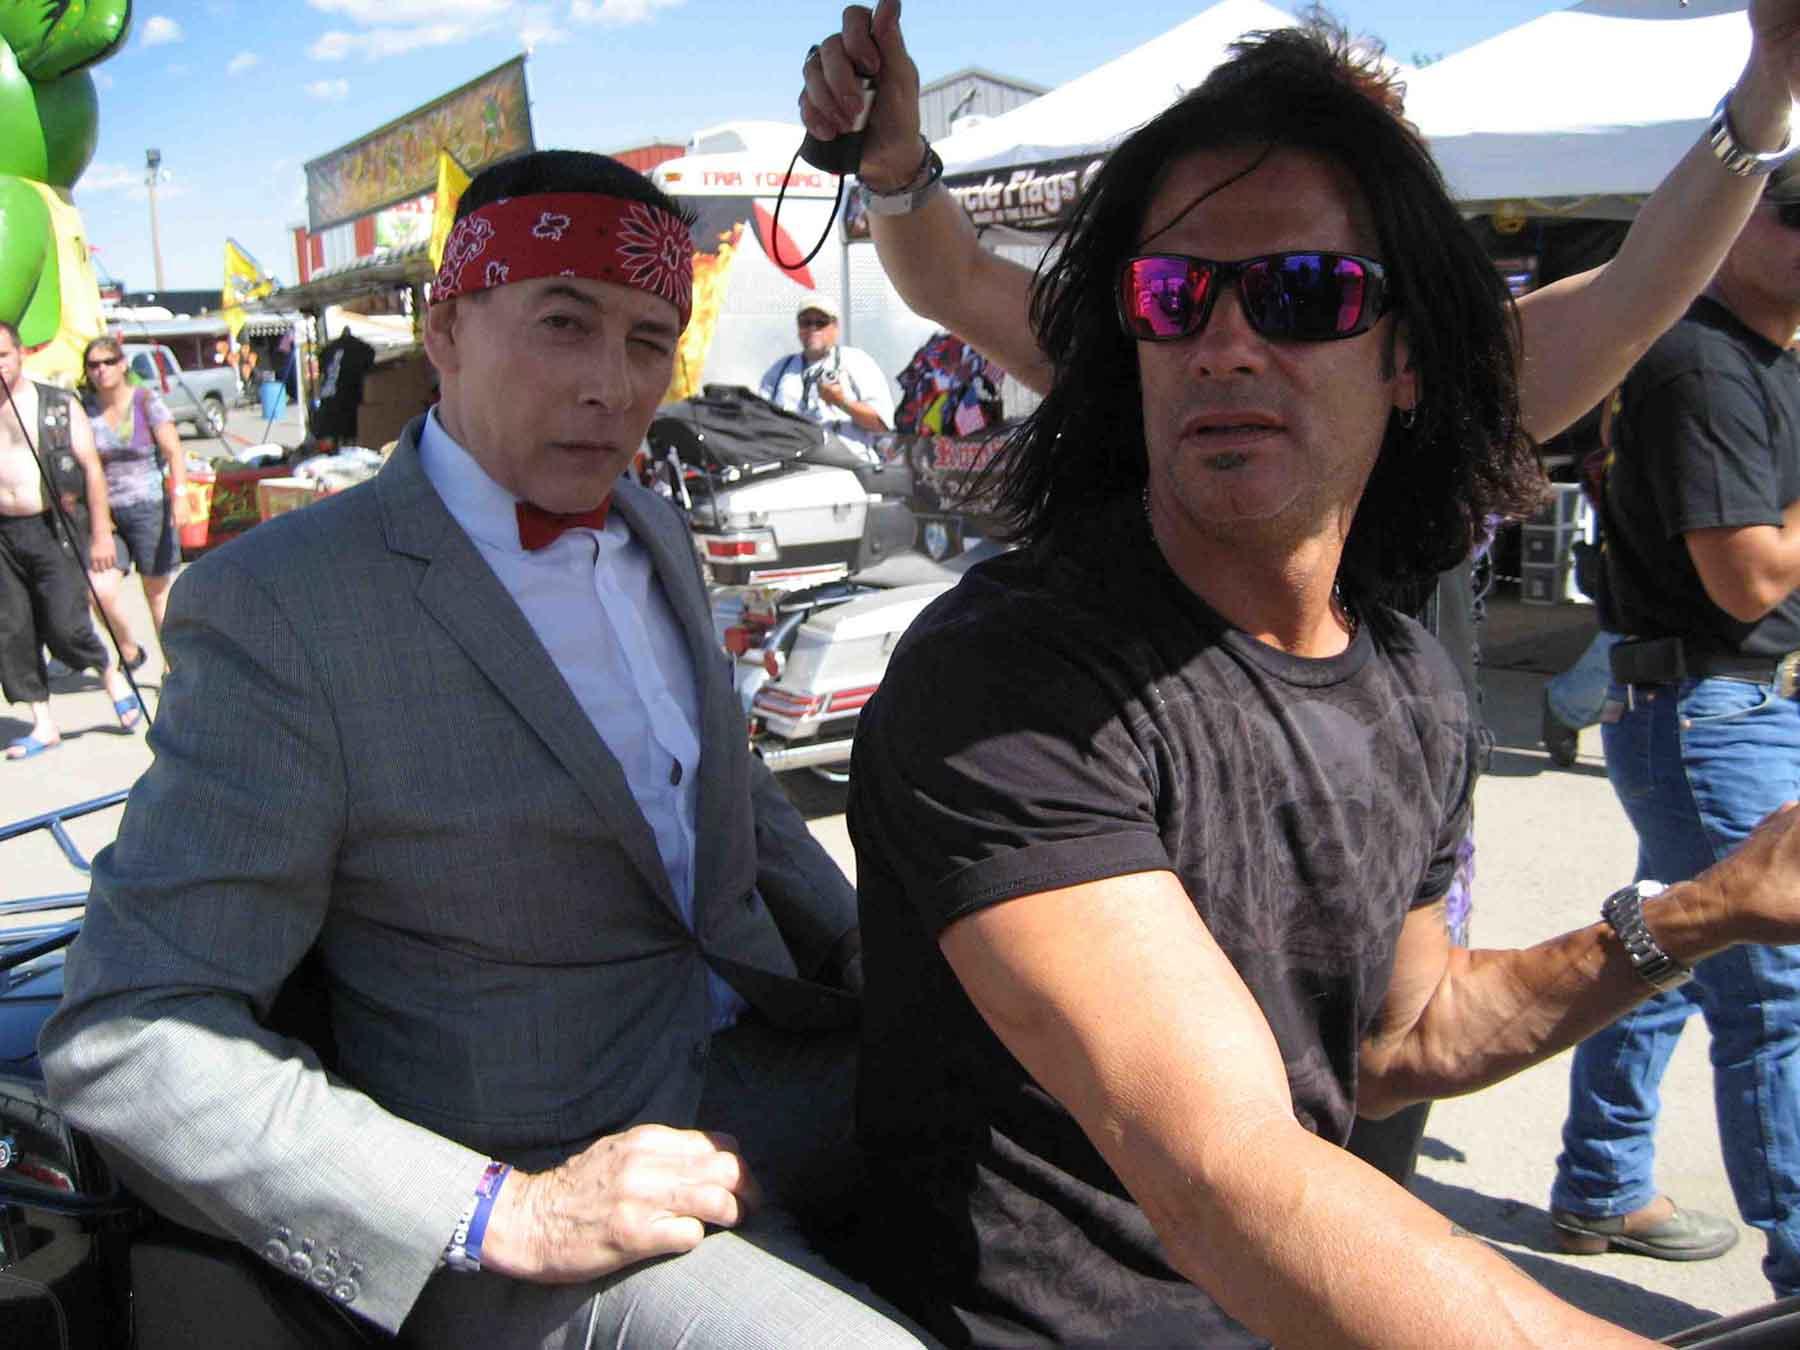 Lorenzo Lamas & Pee-wee Sturgis 2010